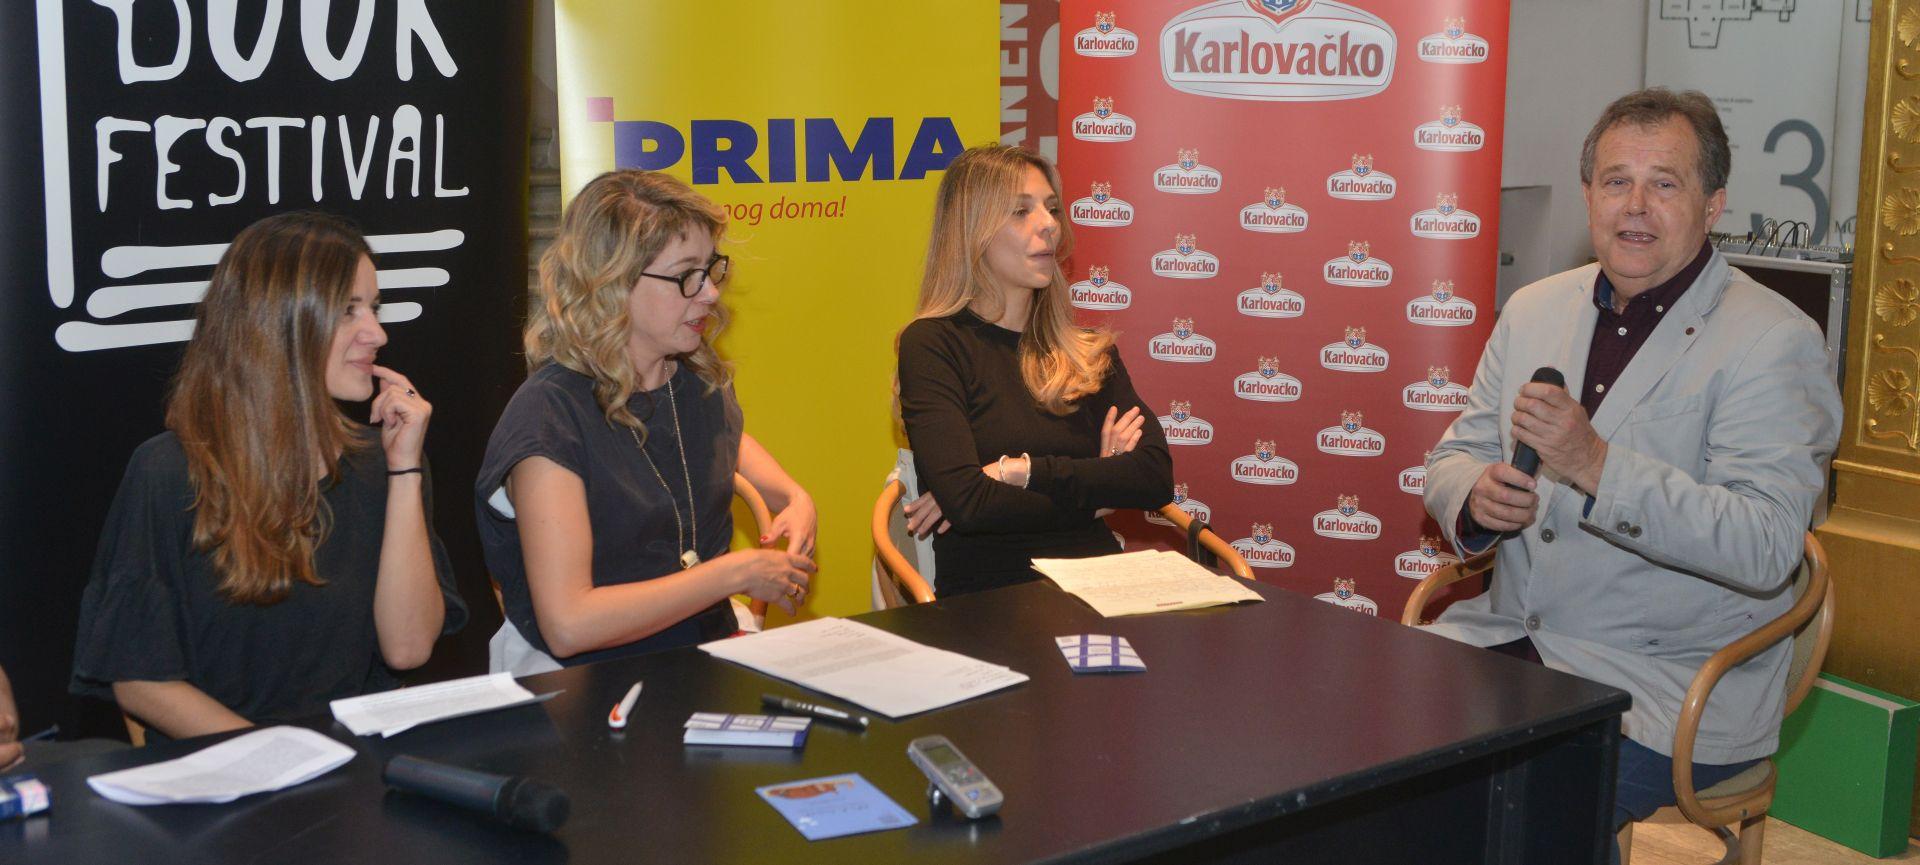 Selfie kultura u središtu 4. Zagreb Book Festivala